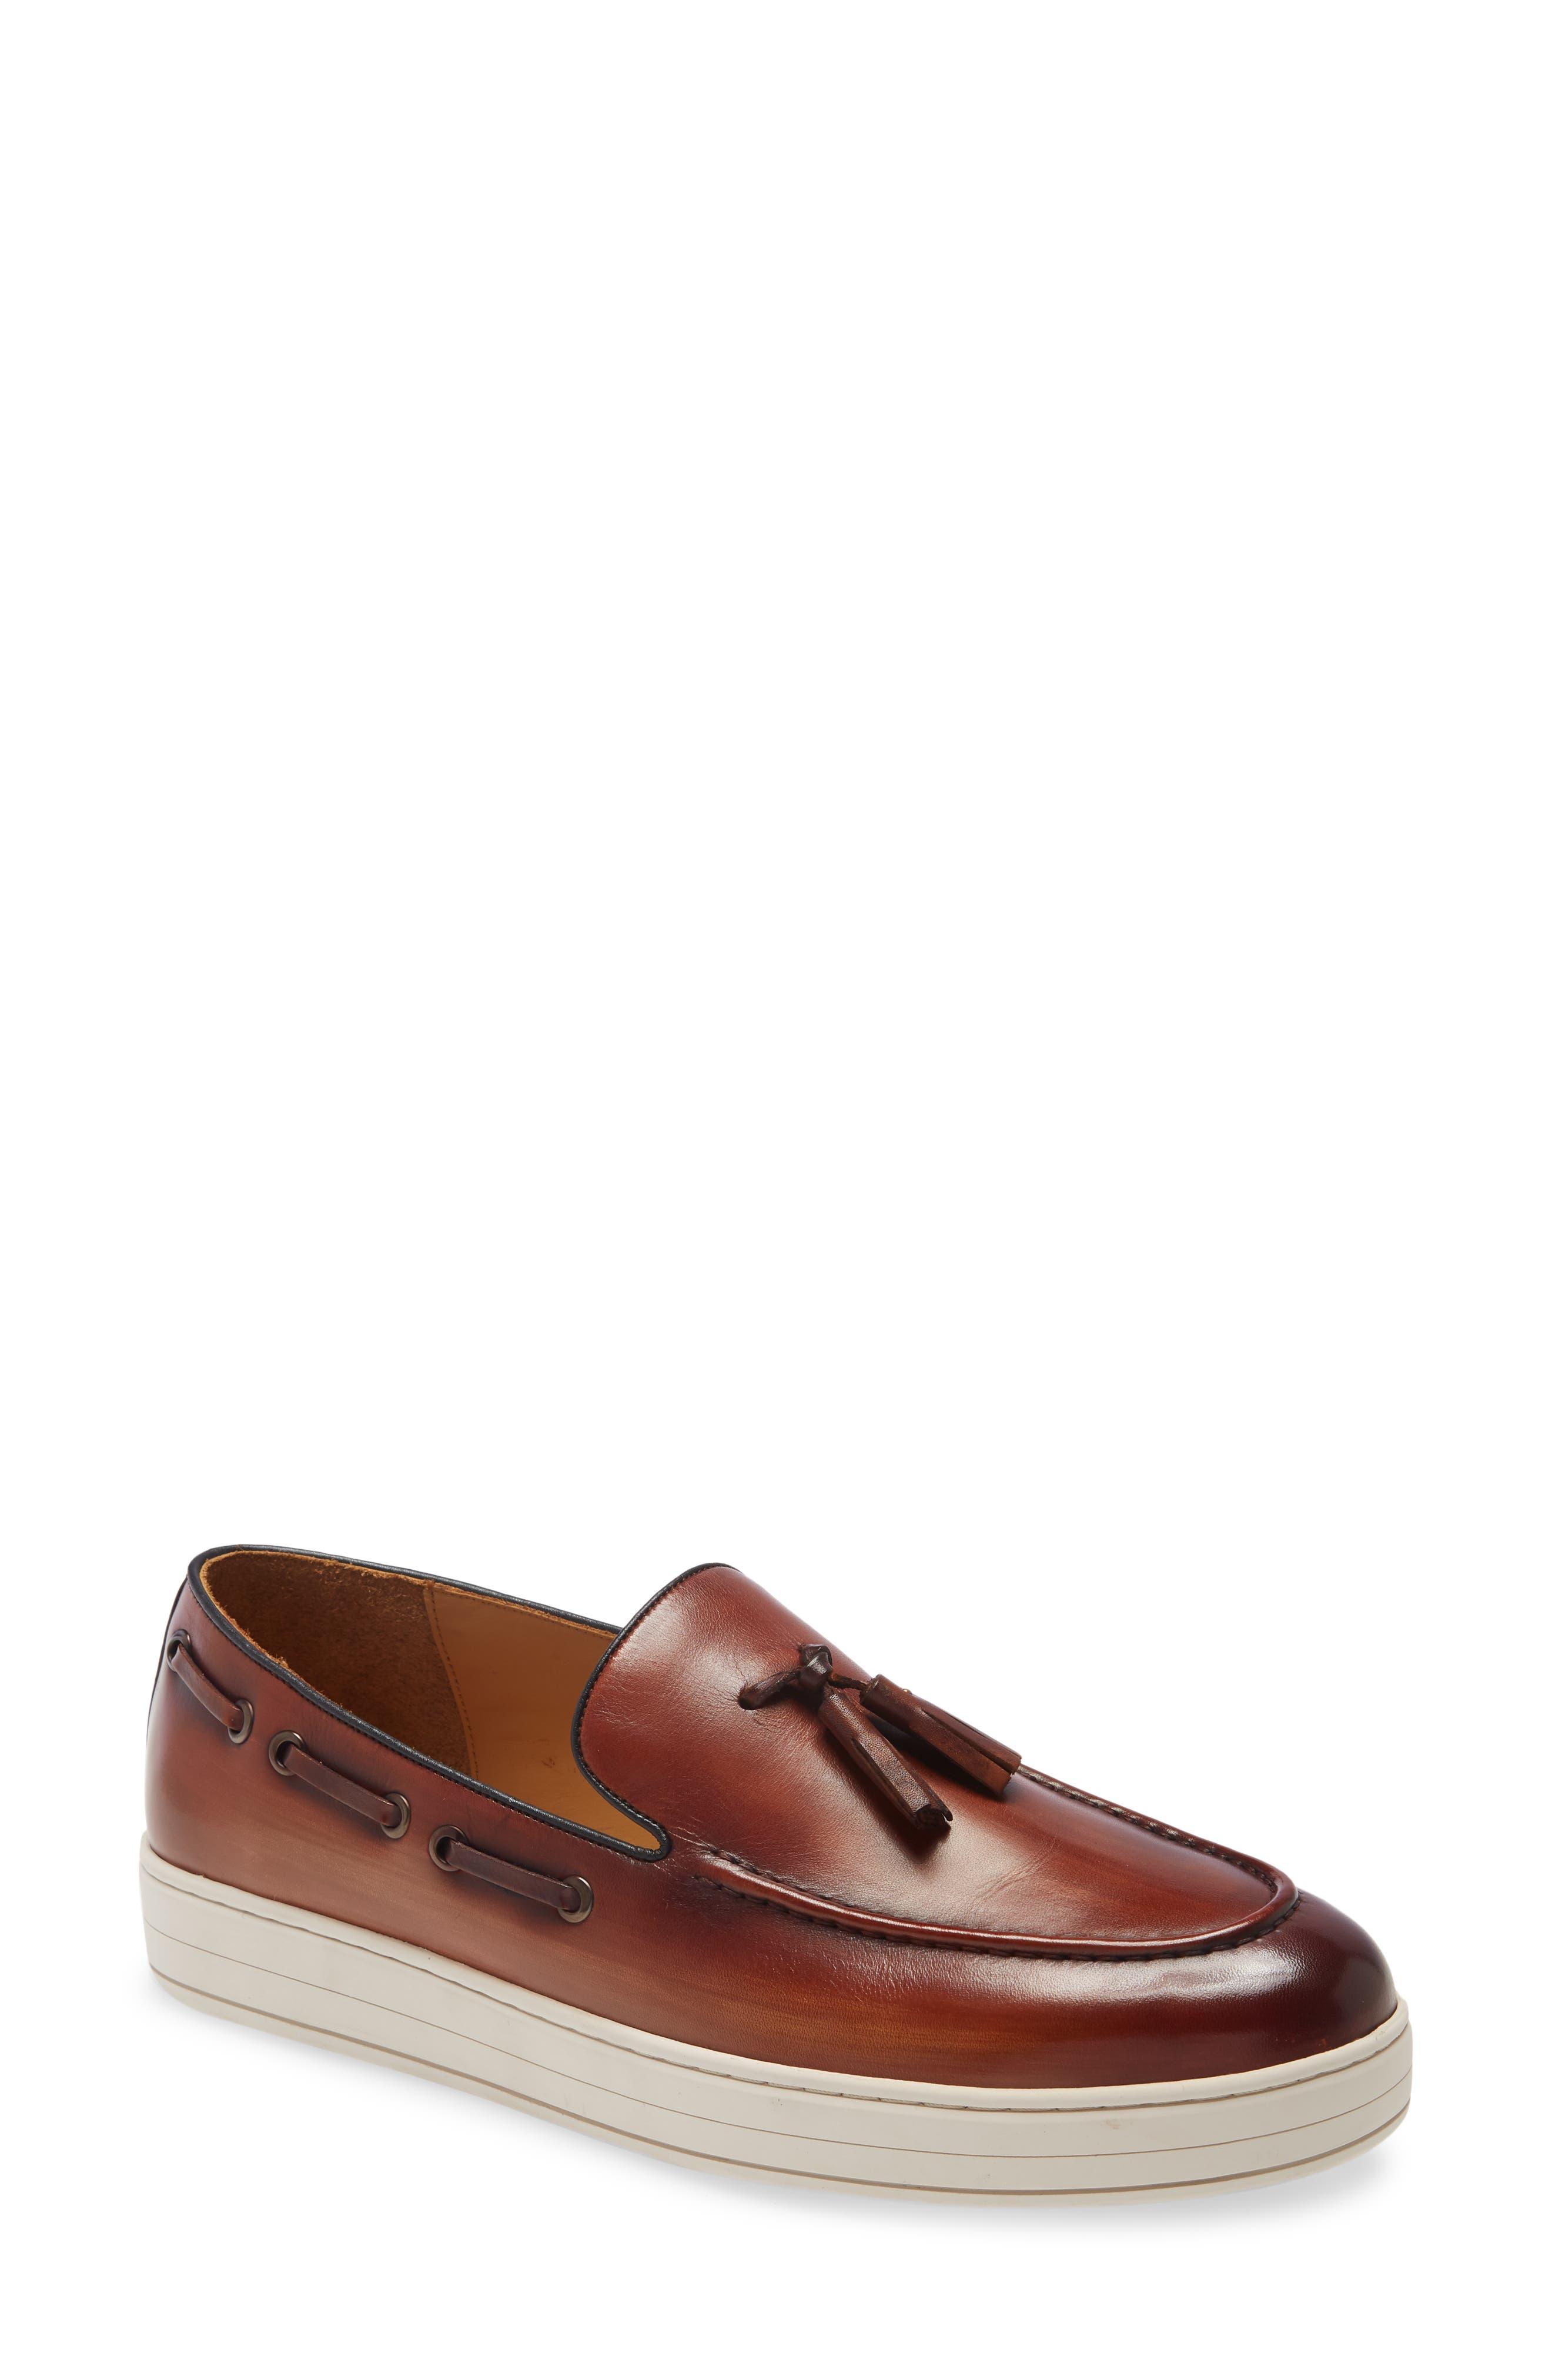 Men's Ike Behar Shoes   Nordstrom